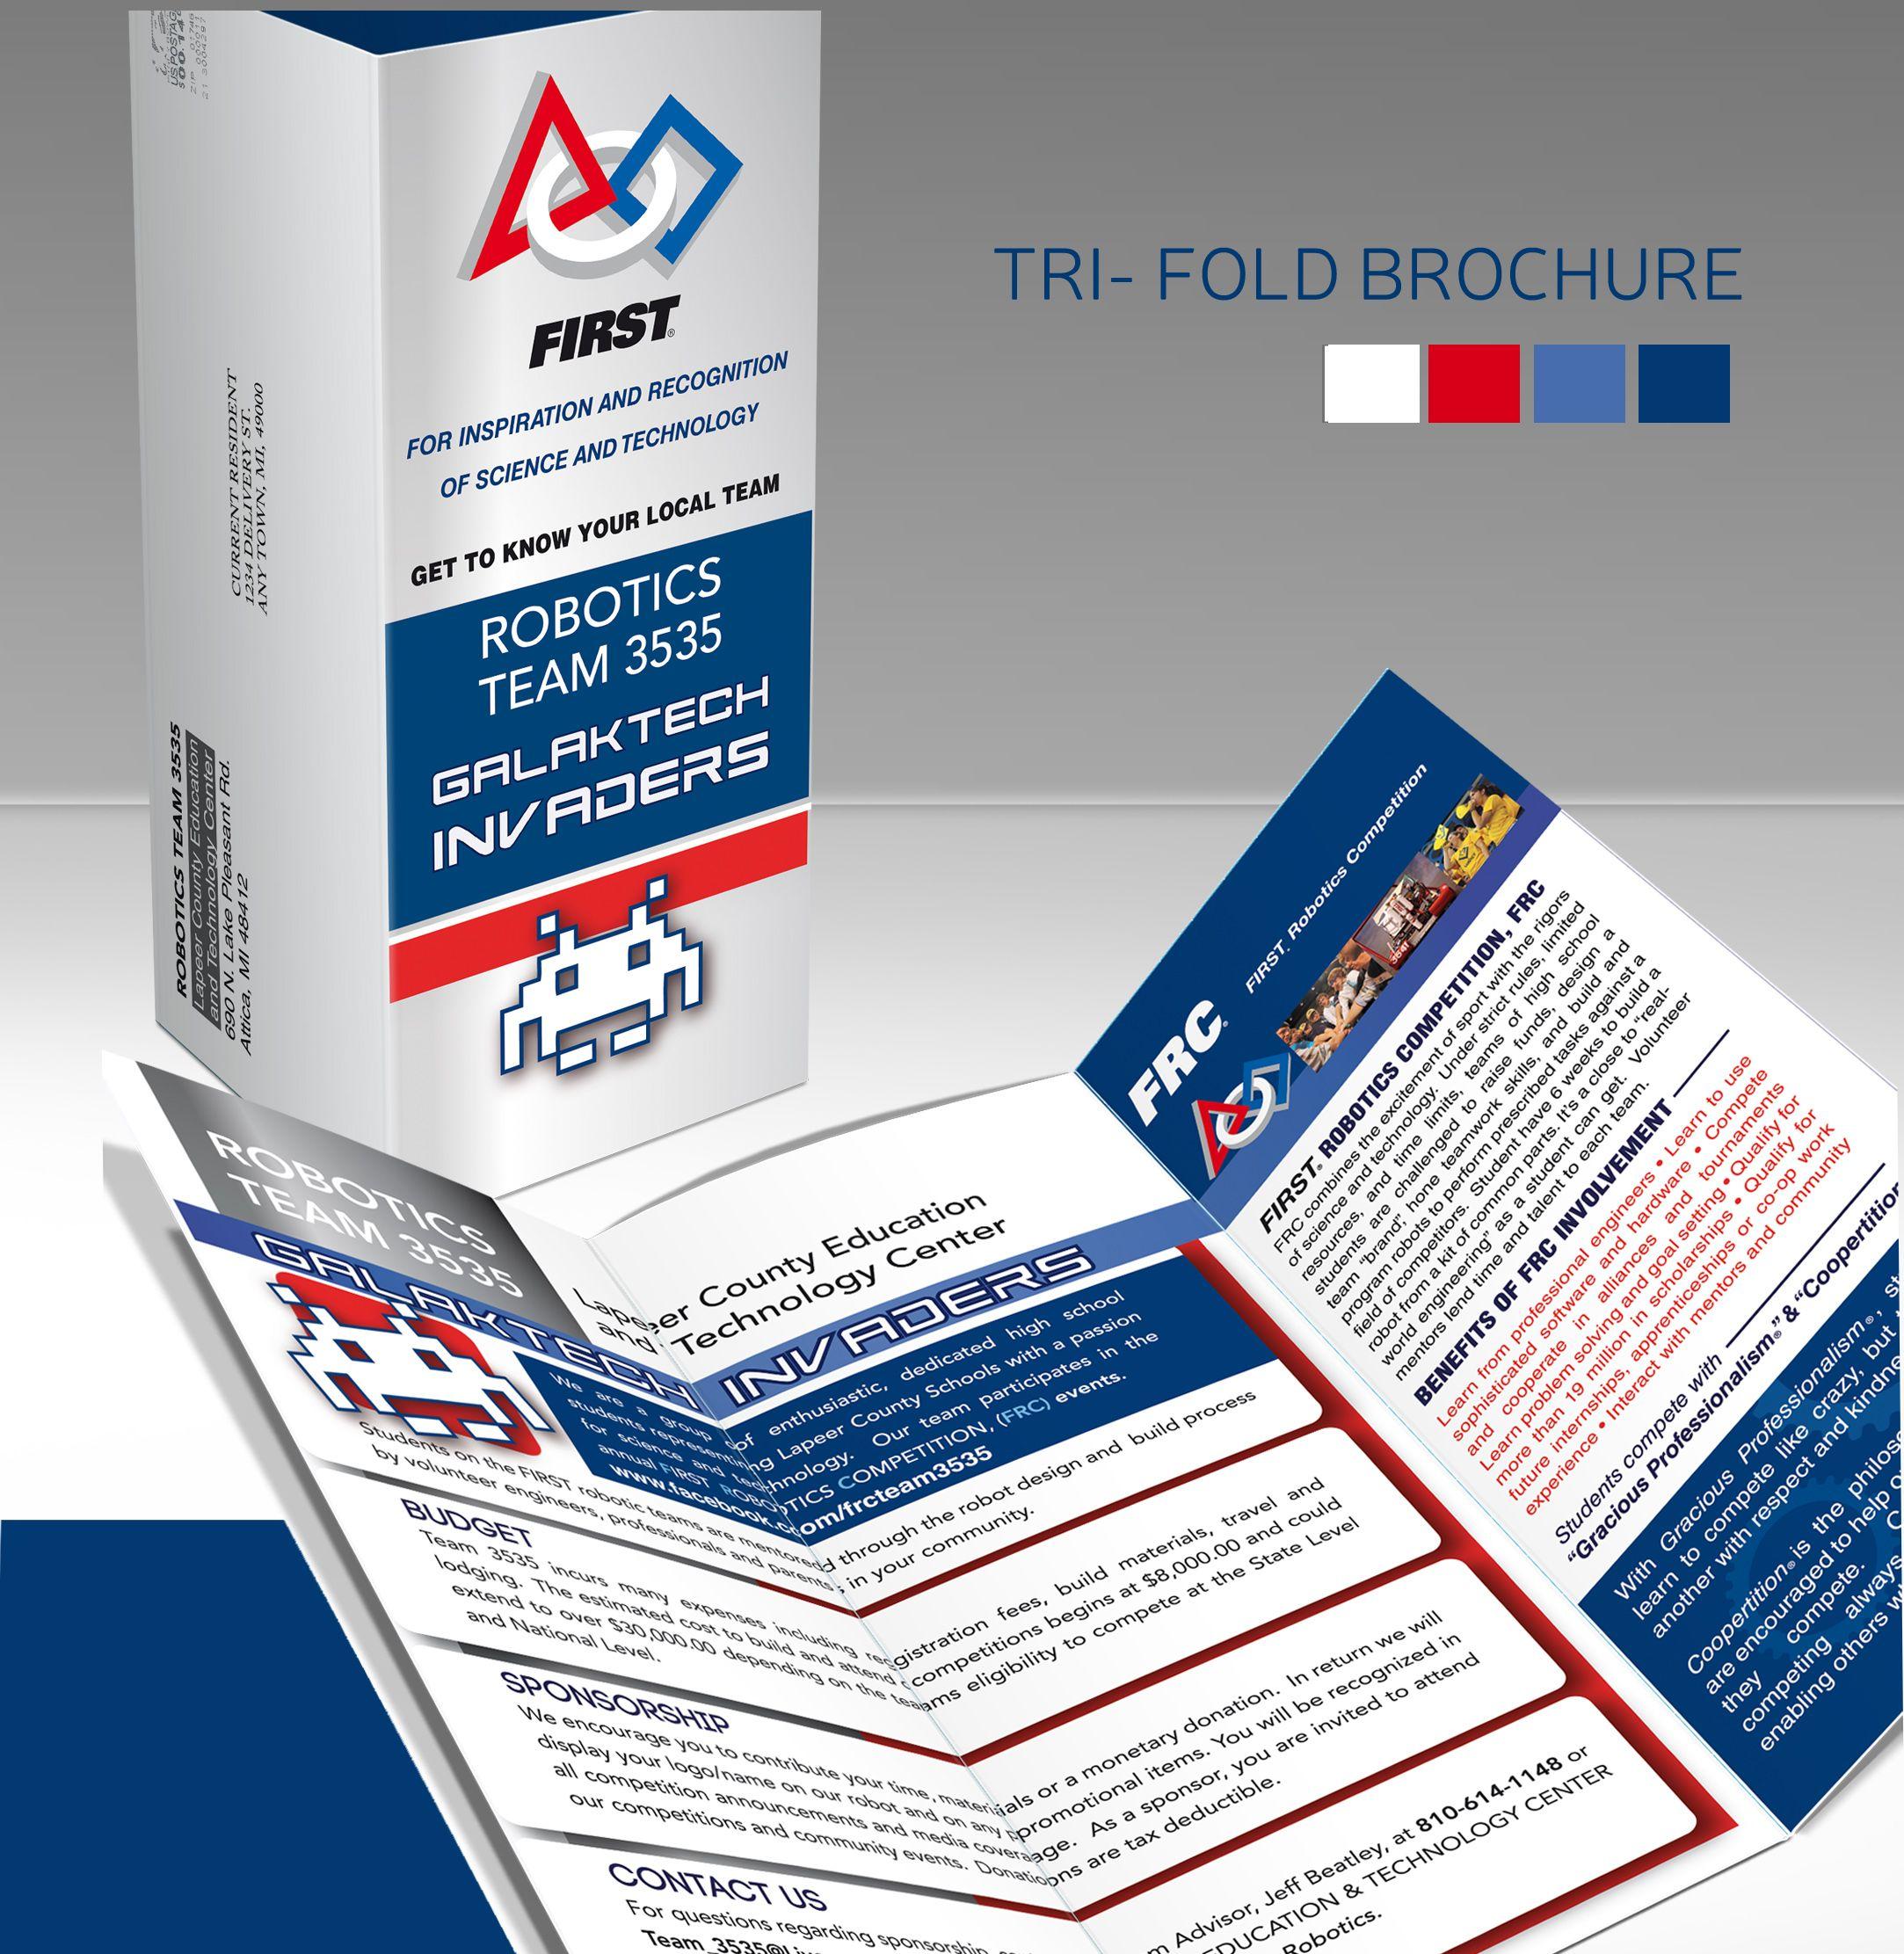 Tri Fold Brochure To Promote Local Frc Robotics Team 3535 Go